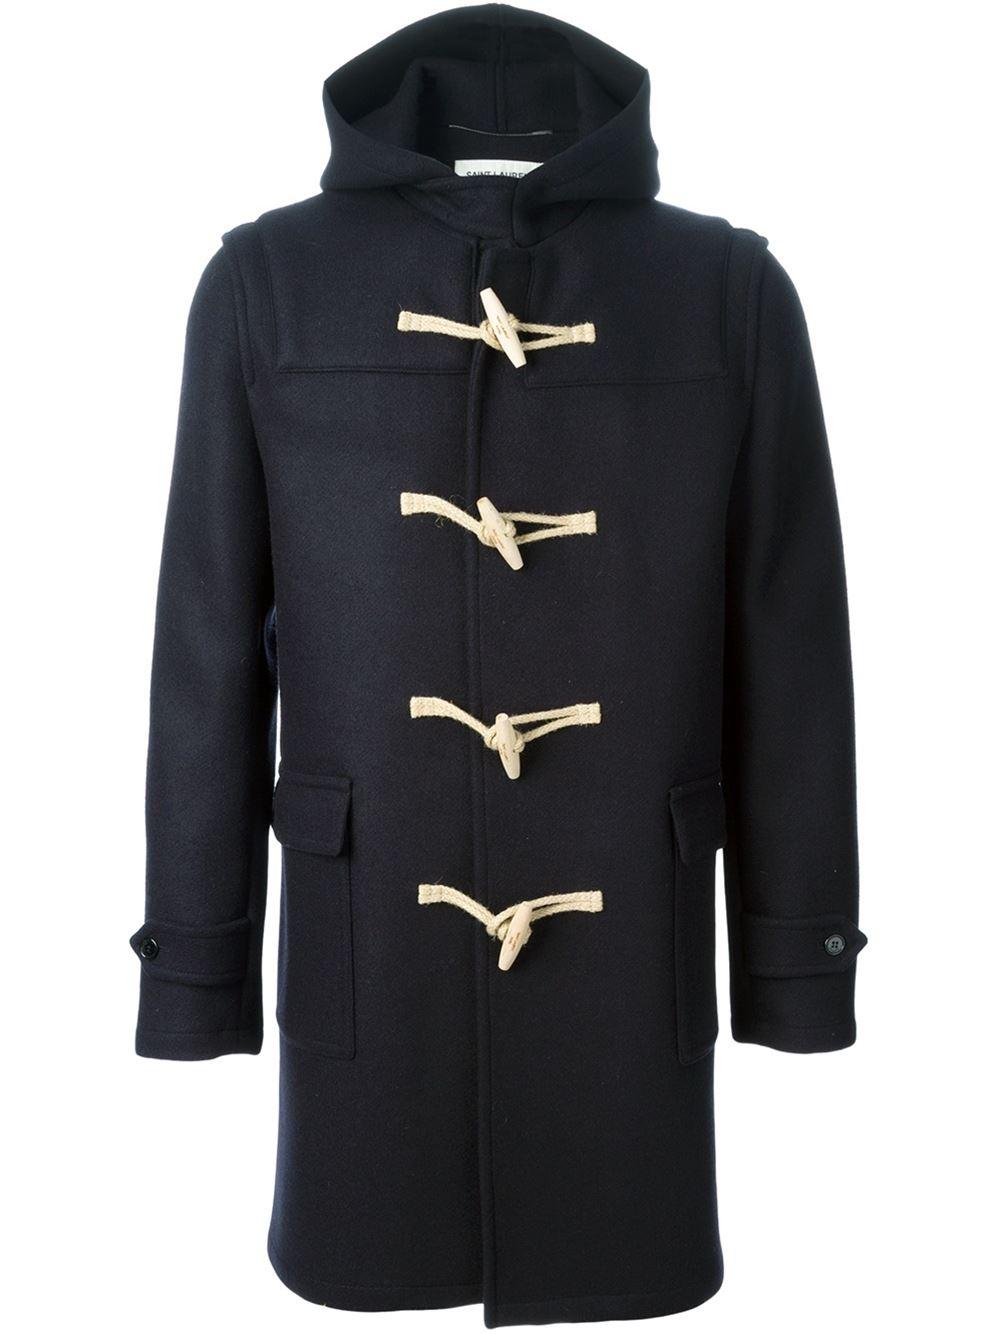 Saint laurent Classic Duffle Coat in Blue for Men | Lyst